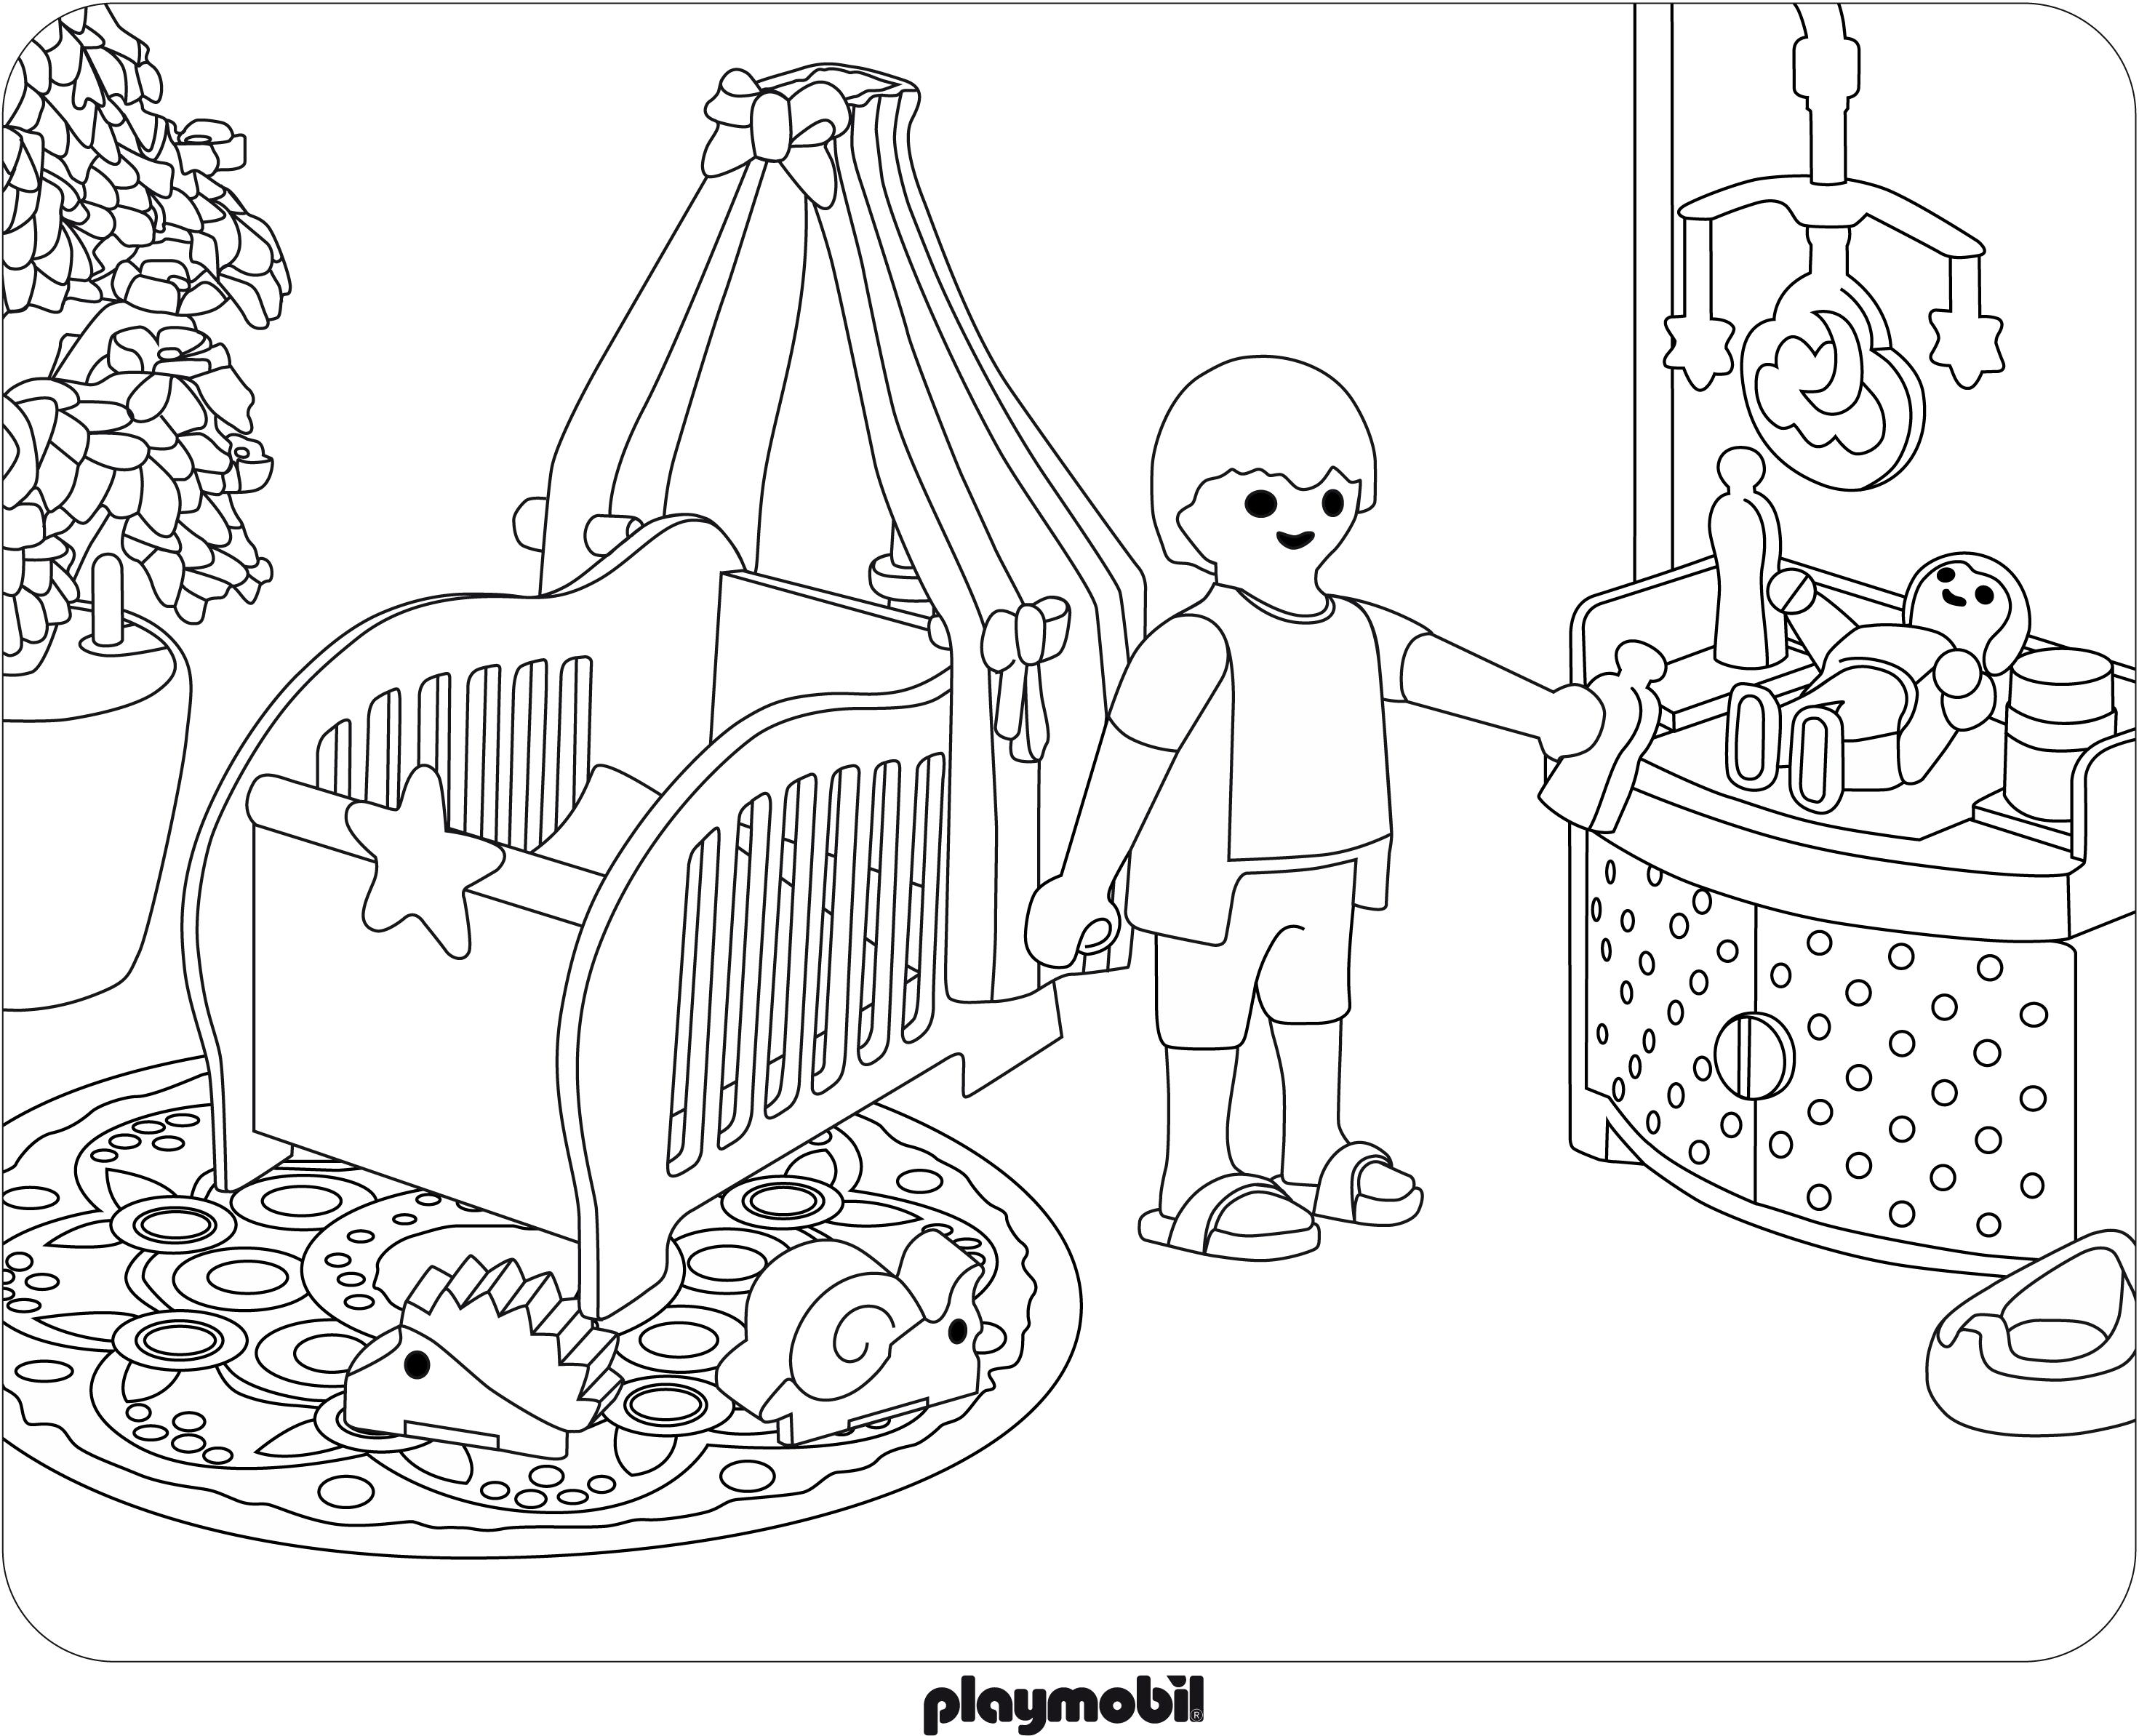 Coloriage Playmobil Jouet A Imprimer